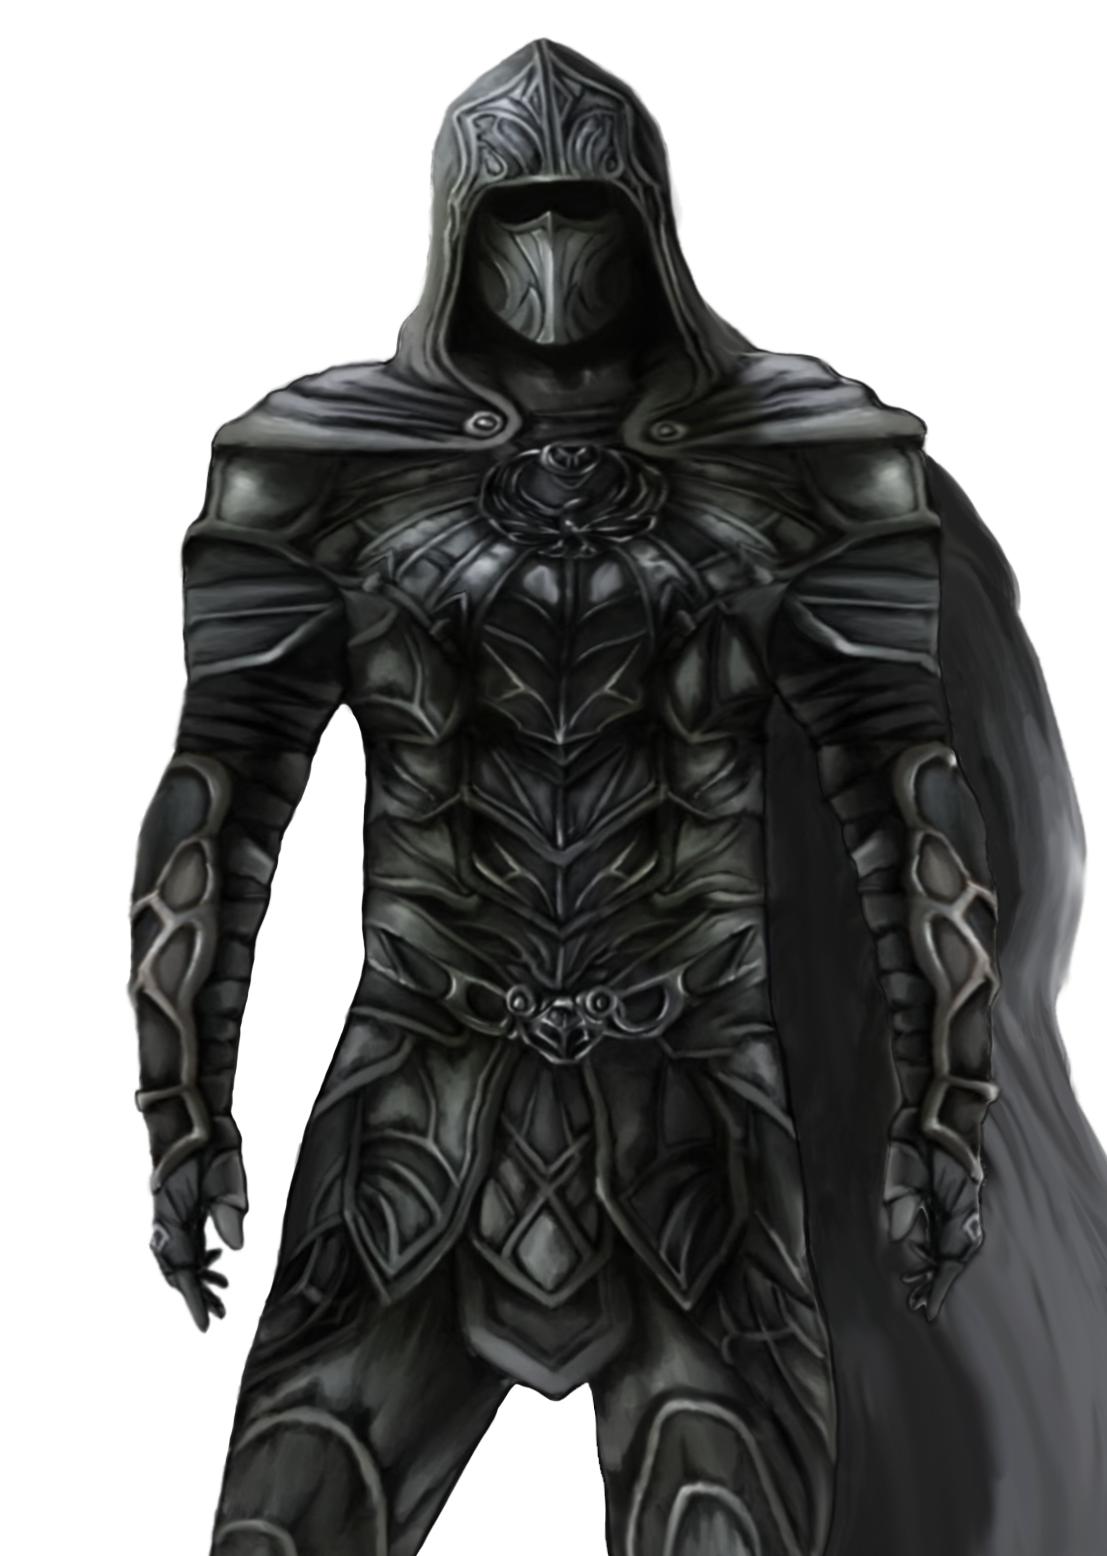 armour artwork claws dark - photo #40